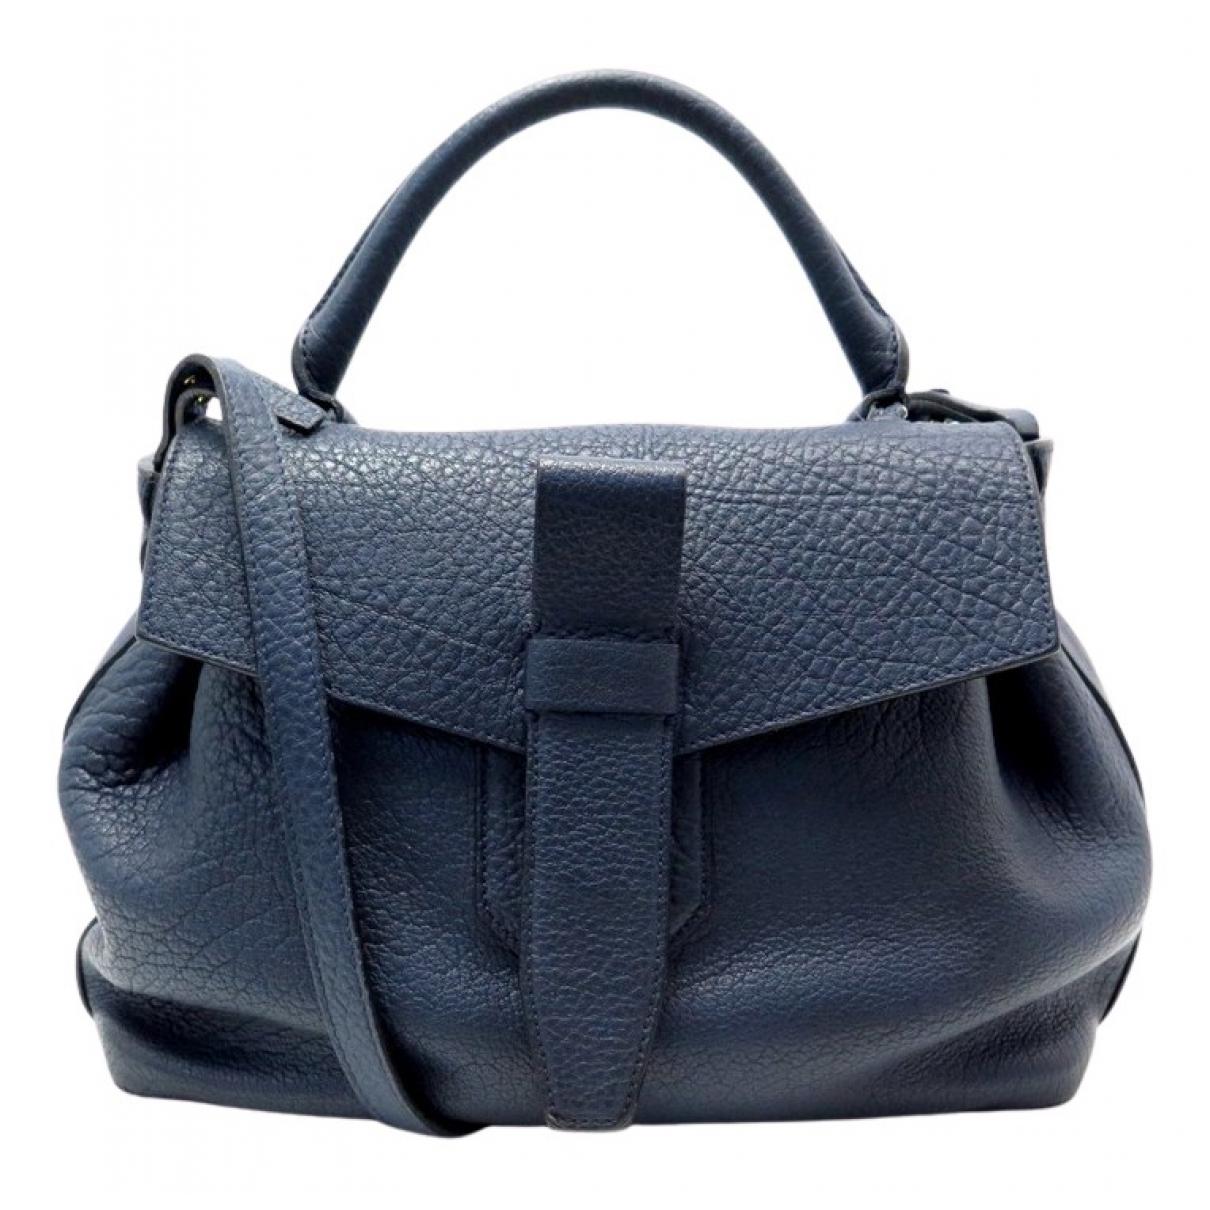 Lancel Charlie Handtasche in  Blau Leder